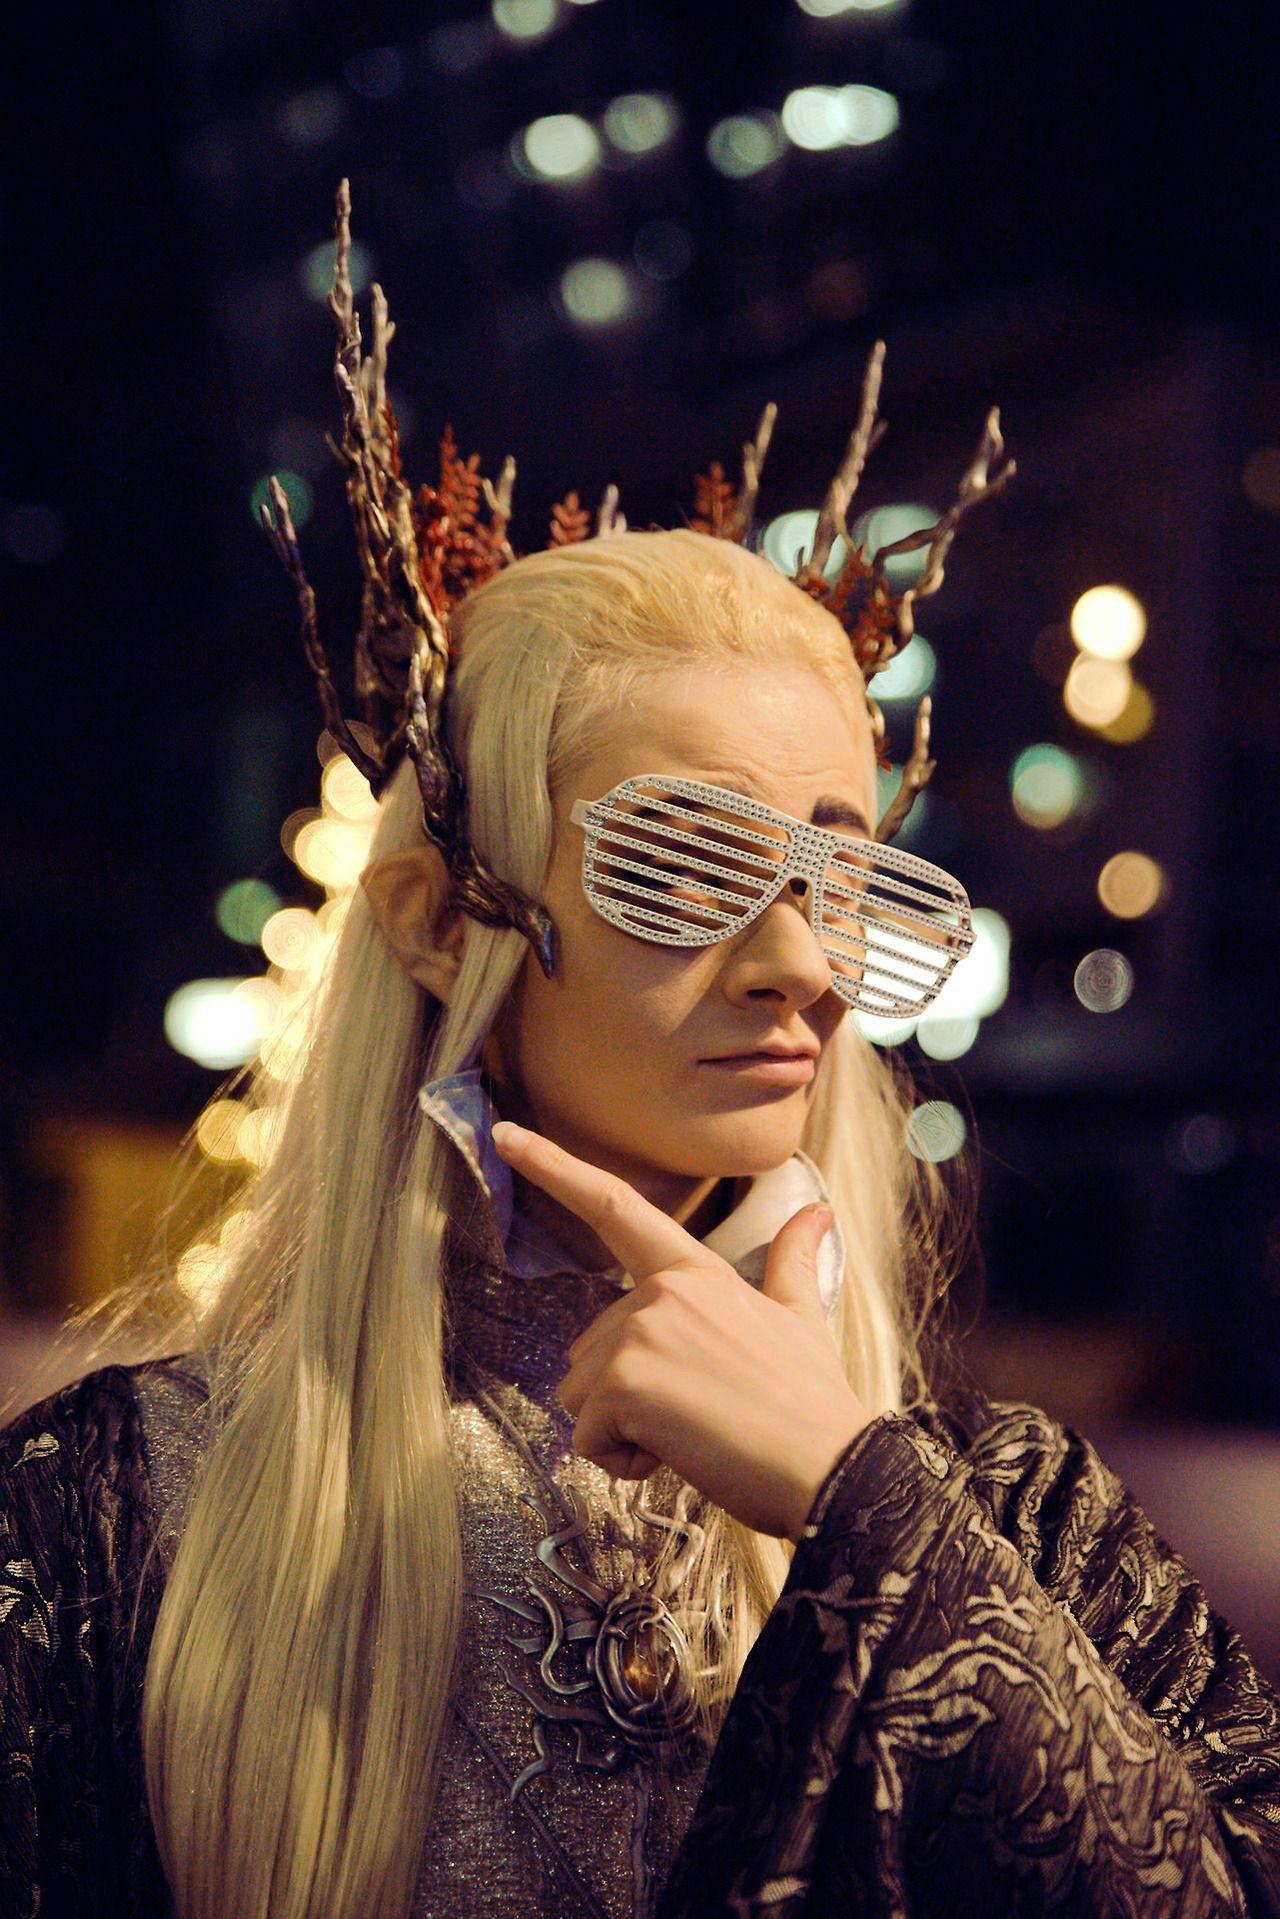 Party King Thranduil (The Hobbit)